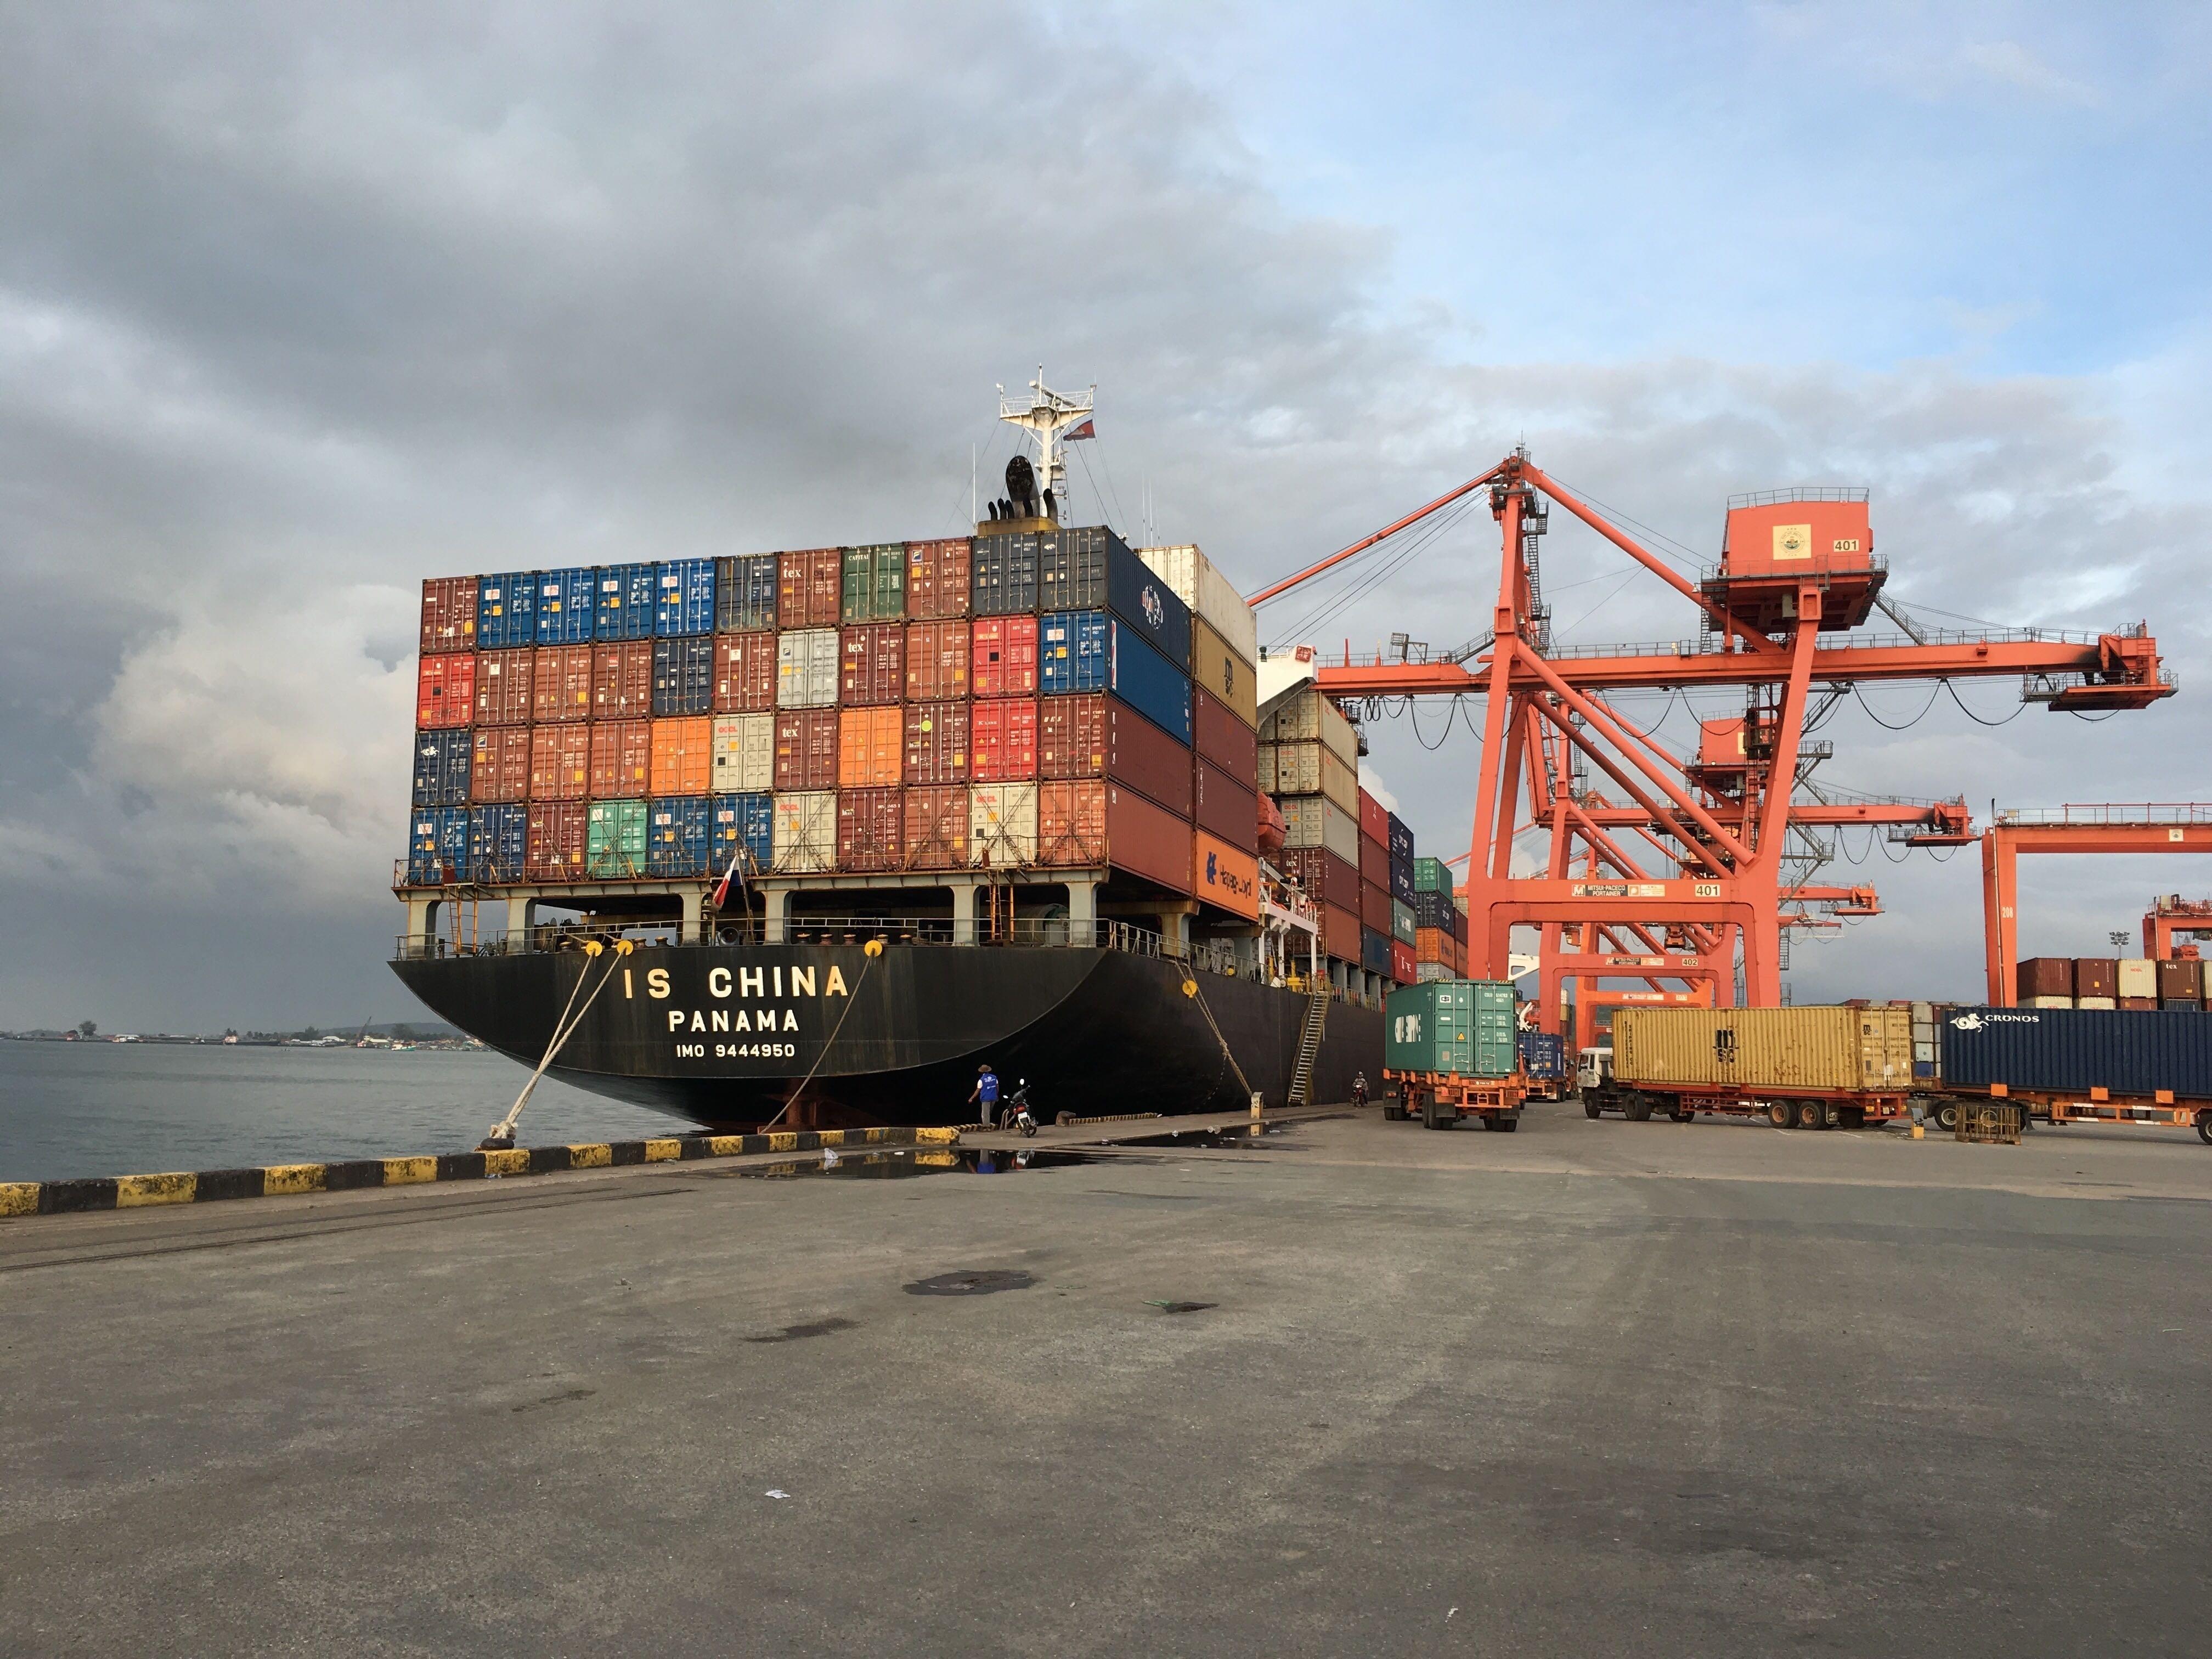 US fines companies exporting goods via Cambodia to dodge Trump's